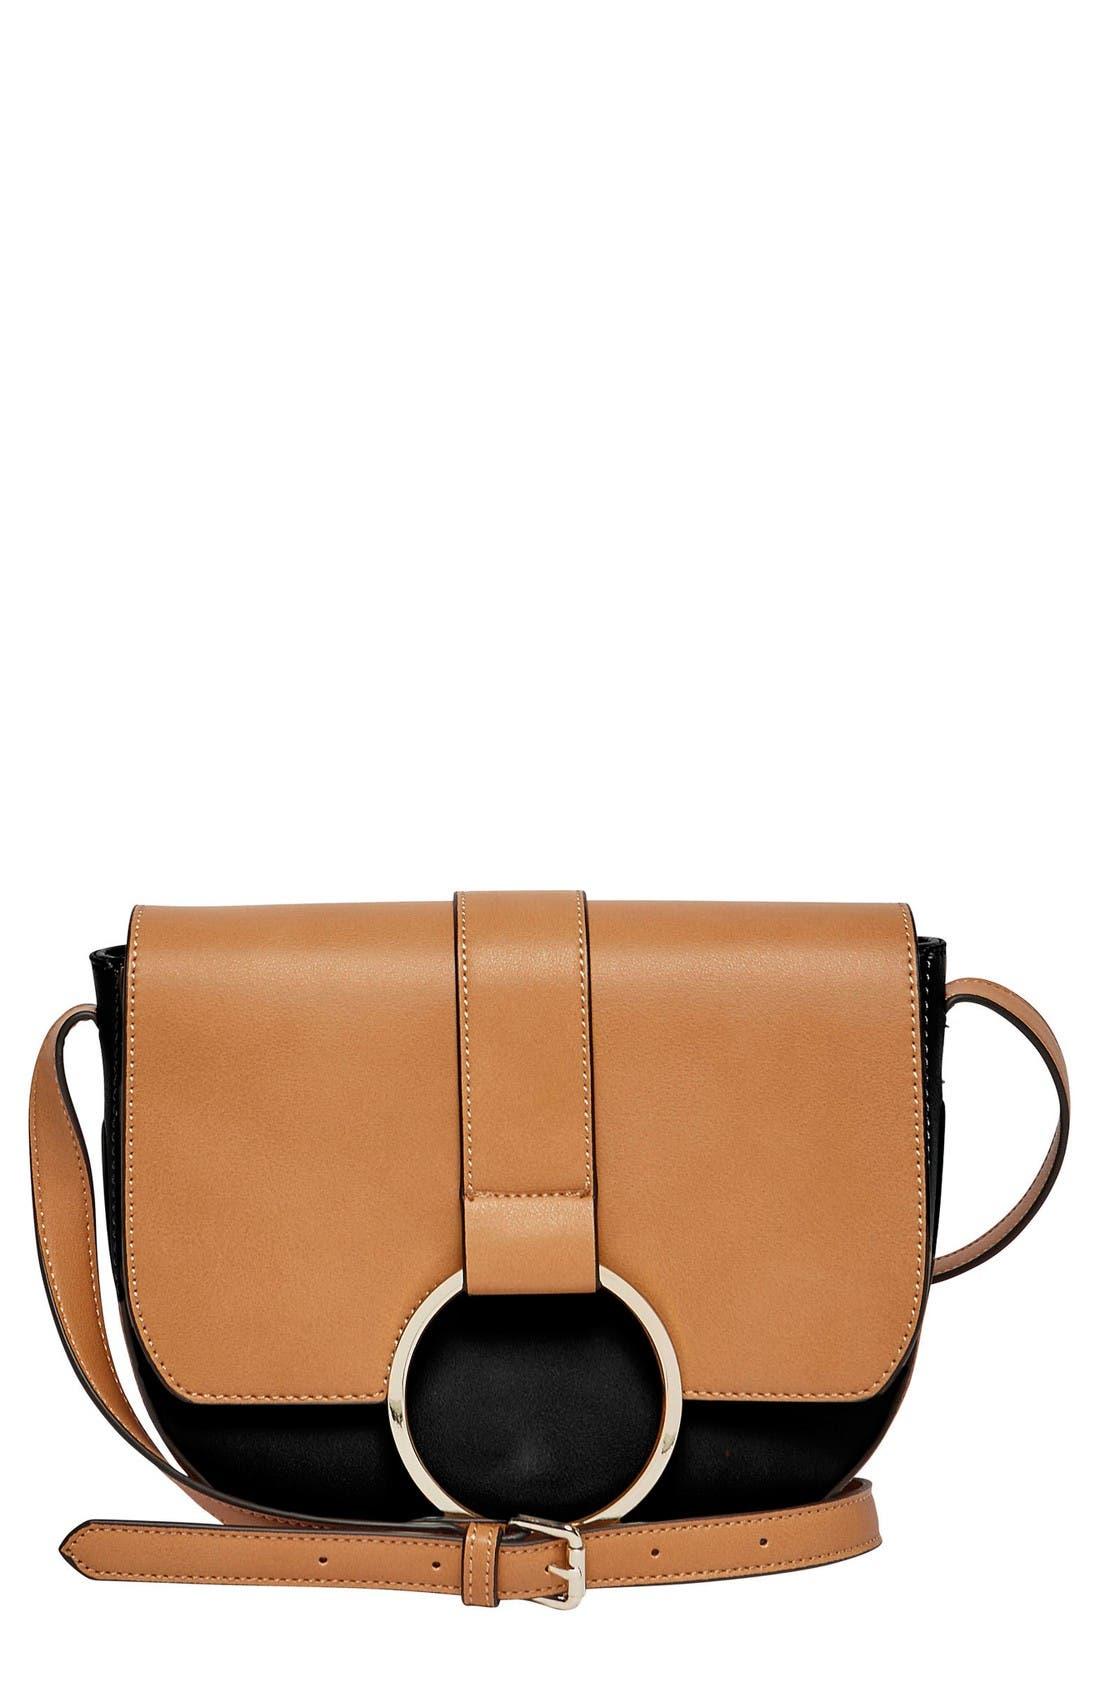 Urban Originals Reckless Destiny Vegan Leather Saddle Bag